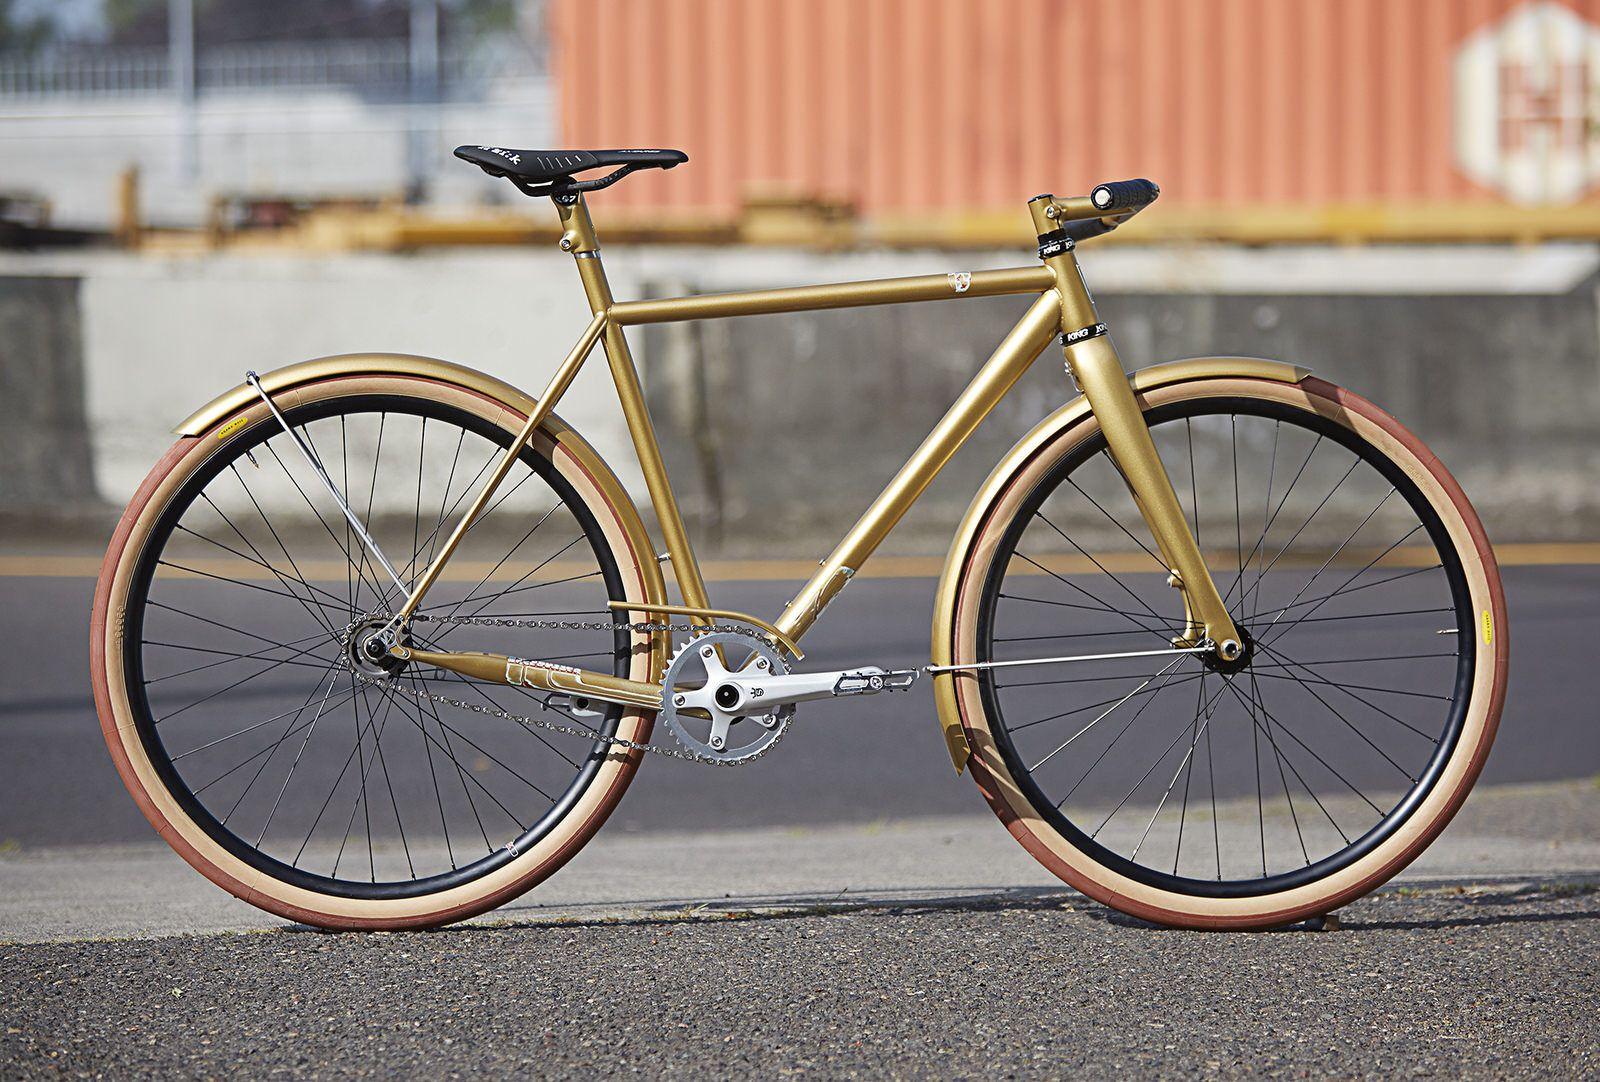 sv2015 ur gold pro bike style with black wheels and saddle see more stylish women